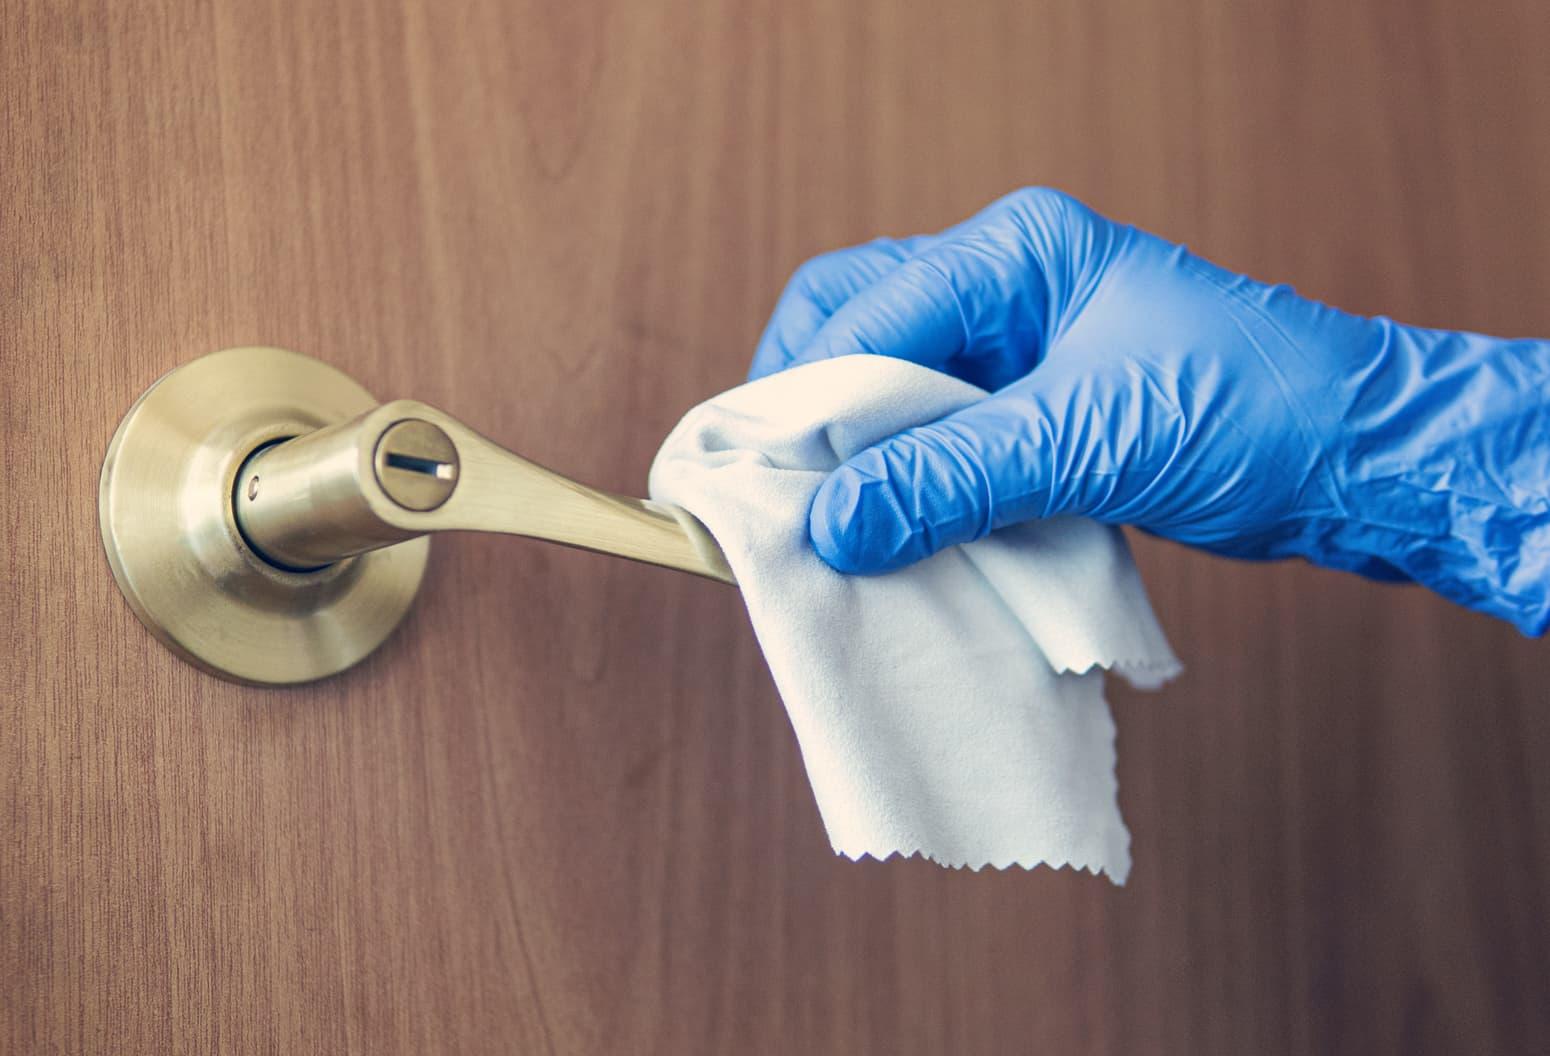 Person wearing gloves disinfecting a door handle